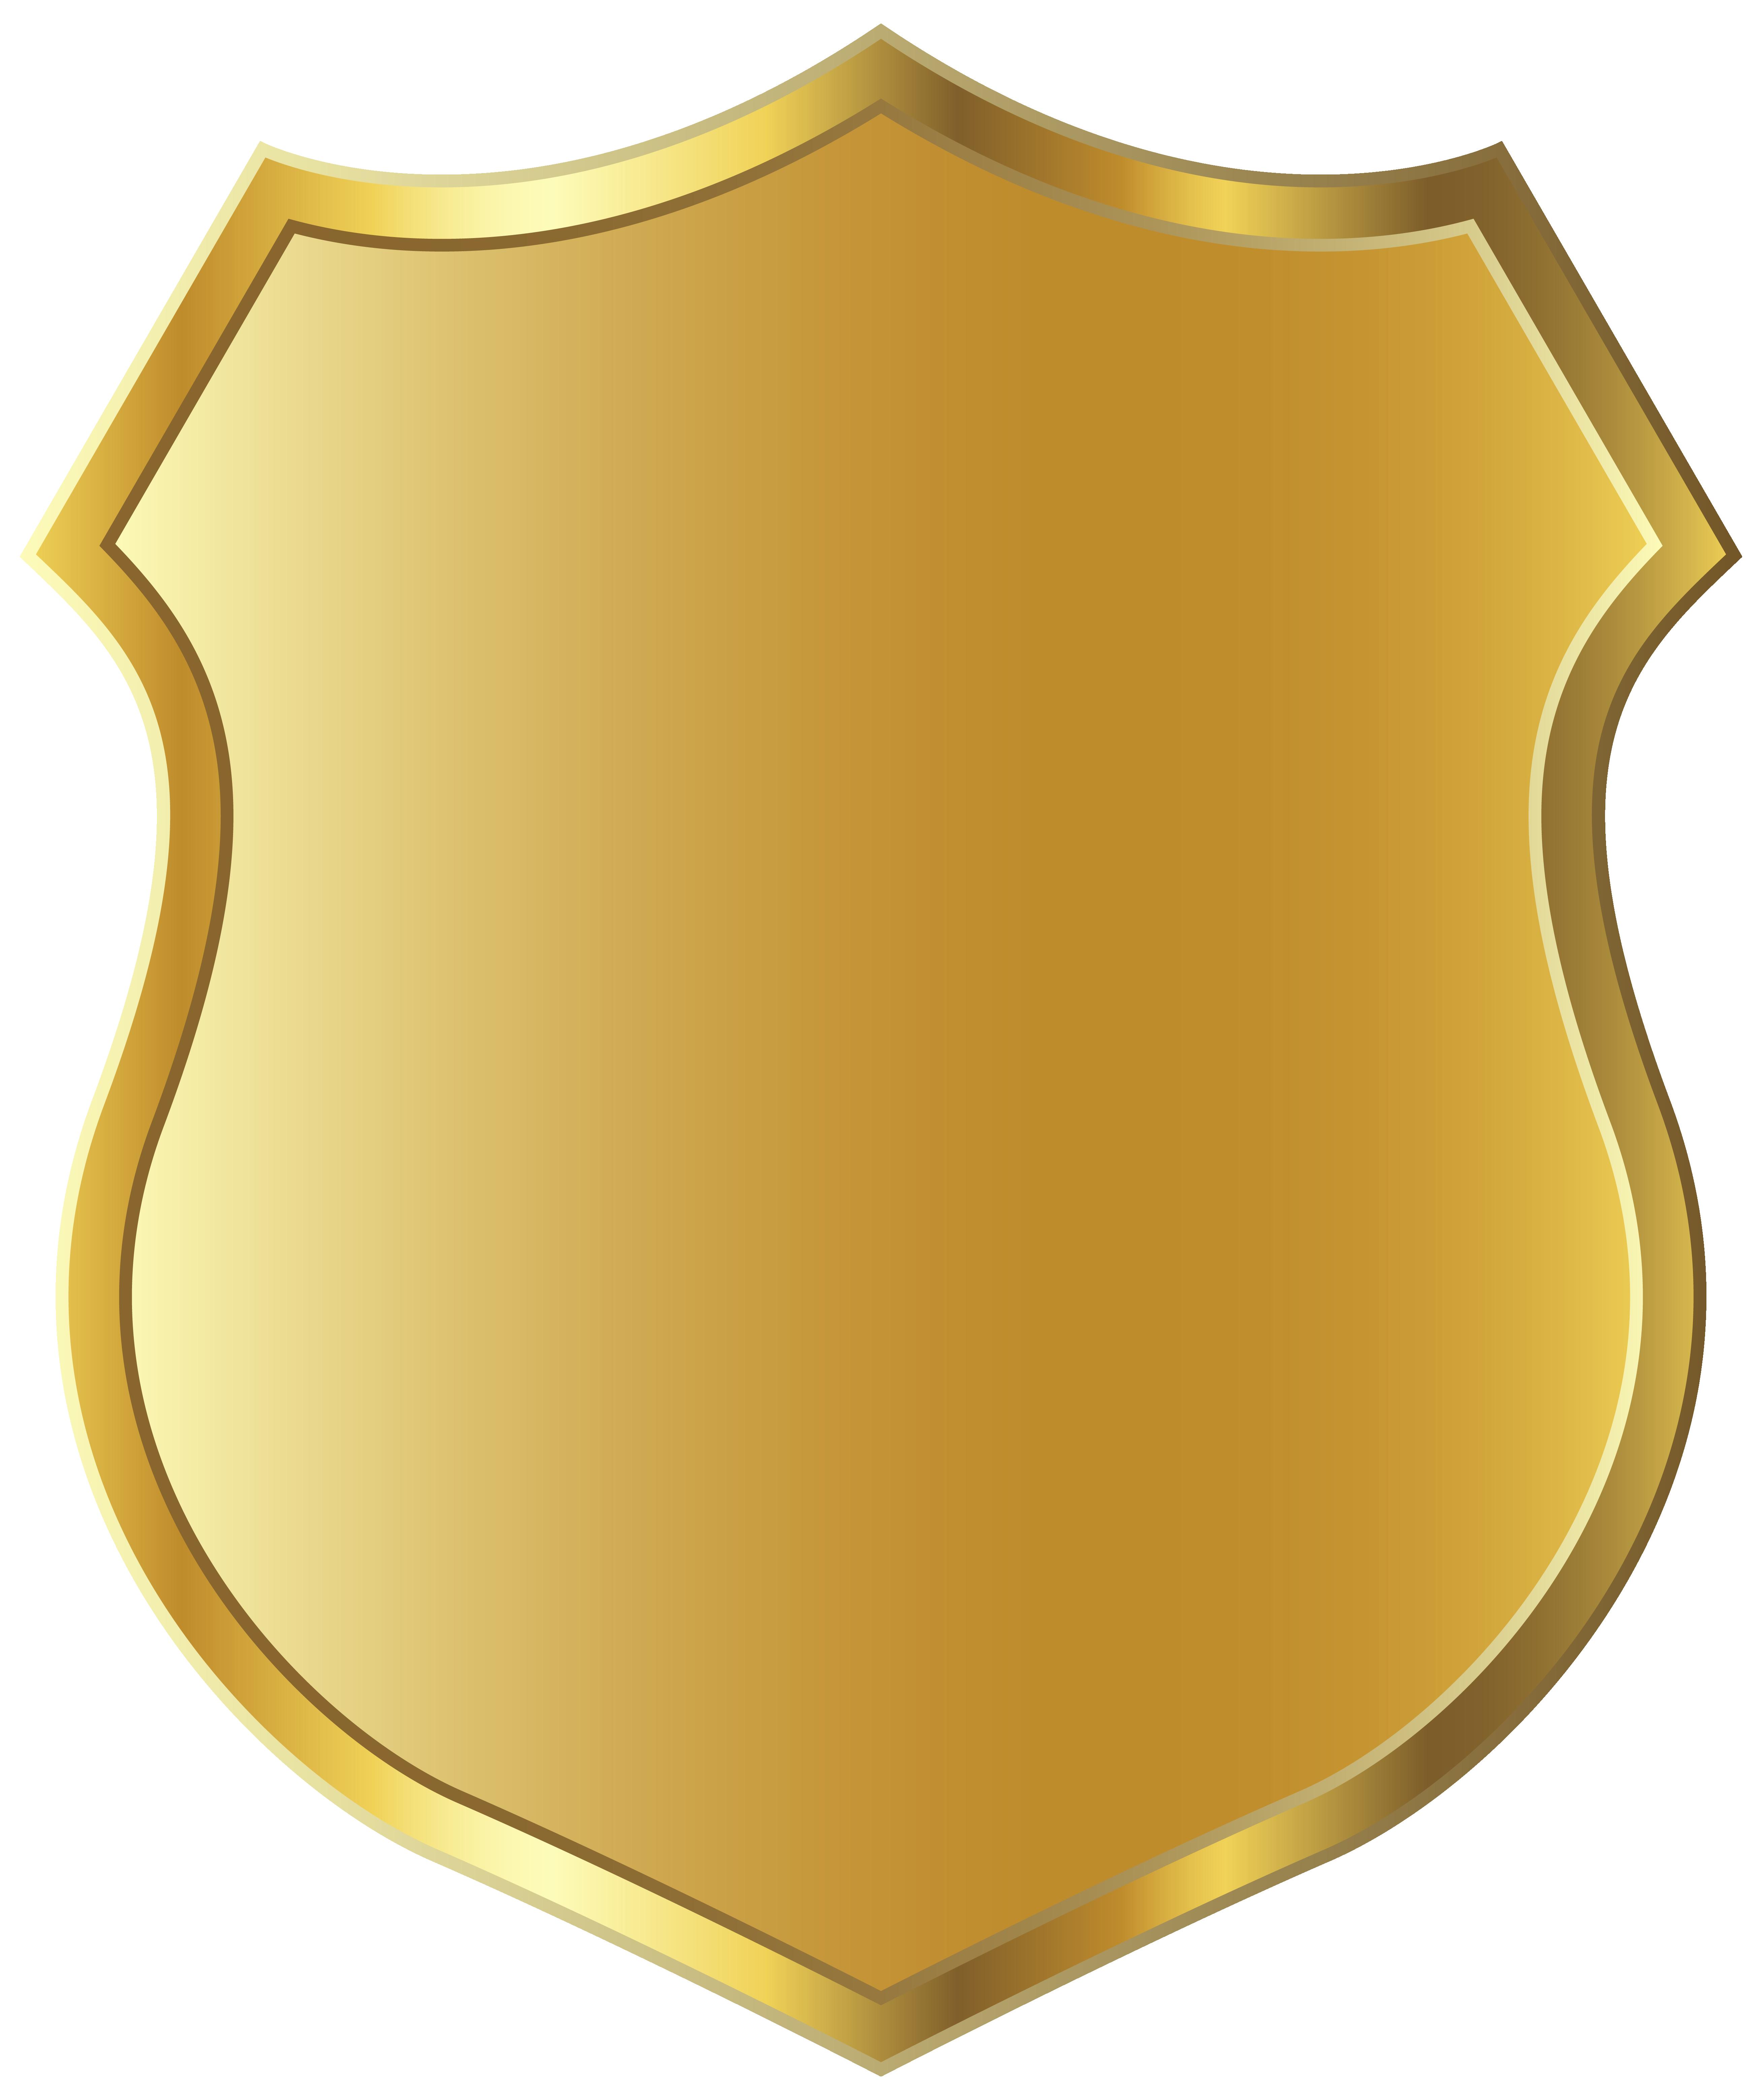 Badge clipart school. Golden template png picture